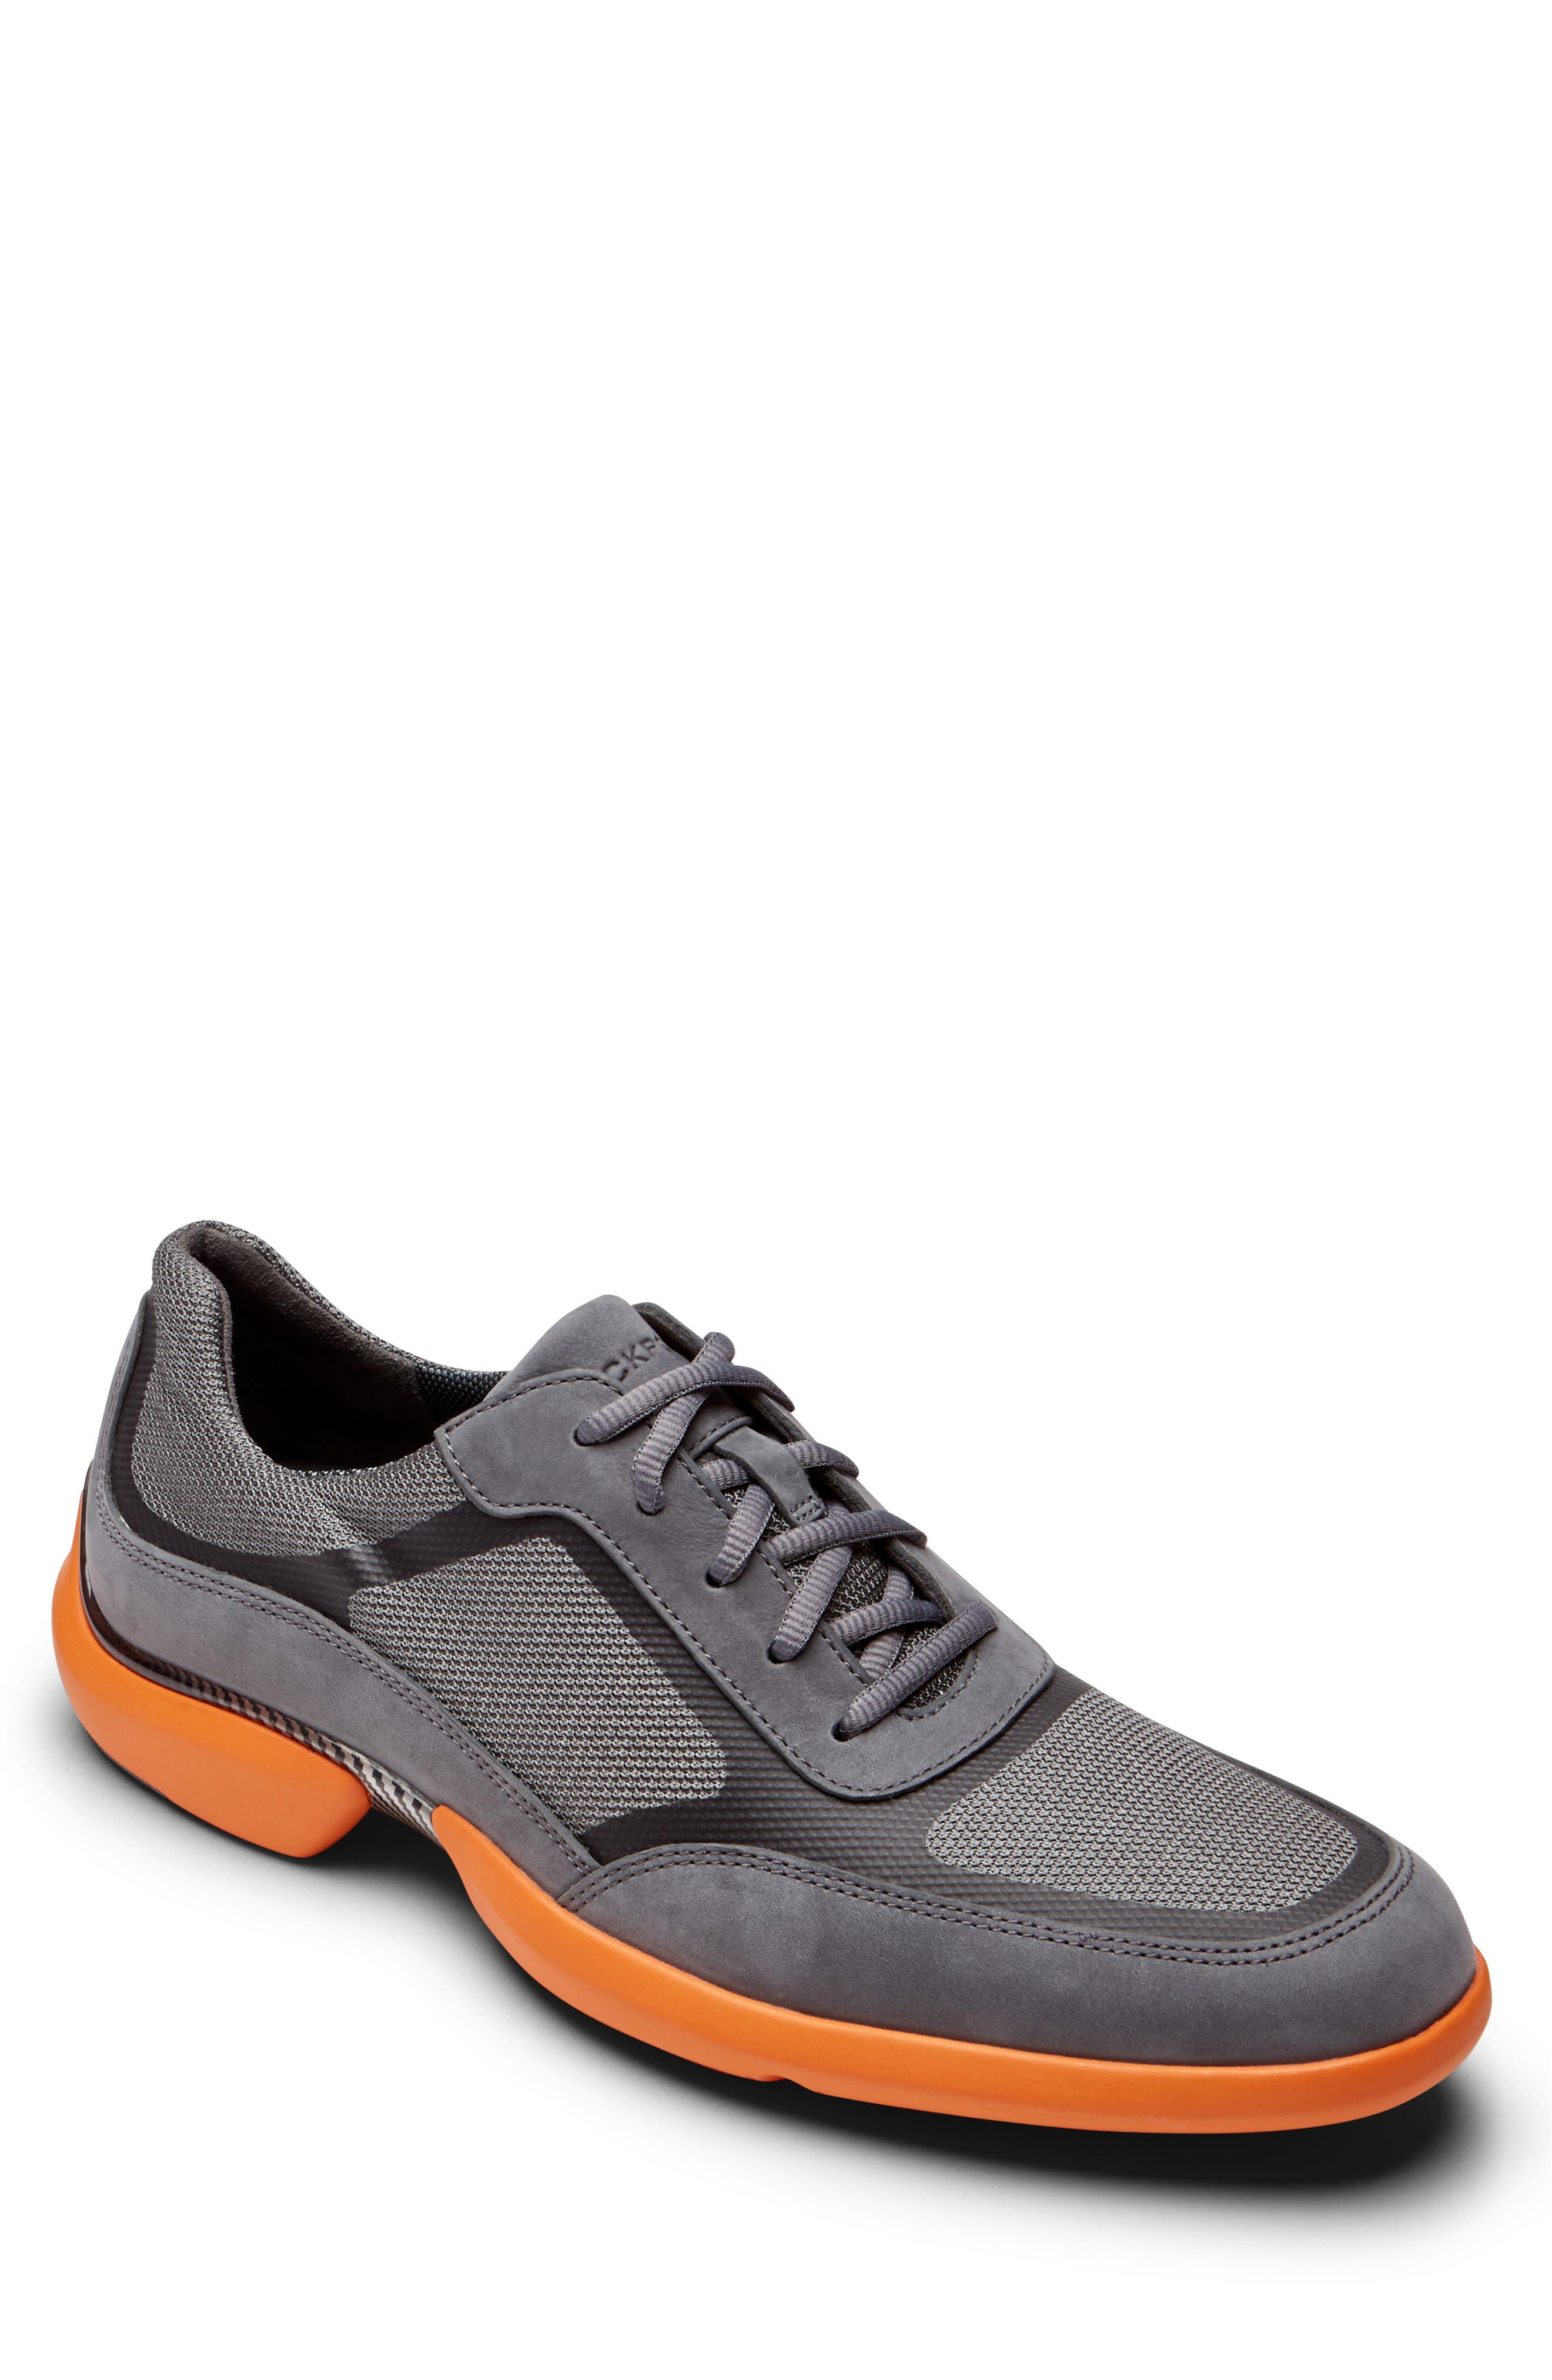 Men's Rockport Shoes Sale \u0026 Clearance